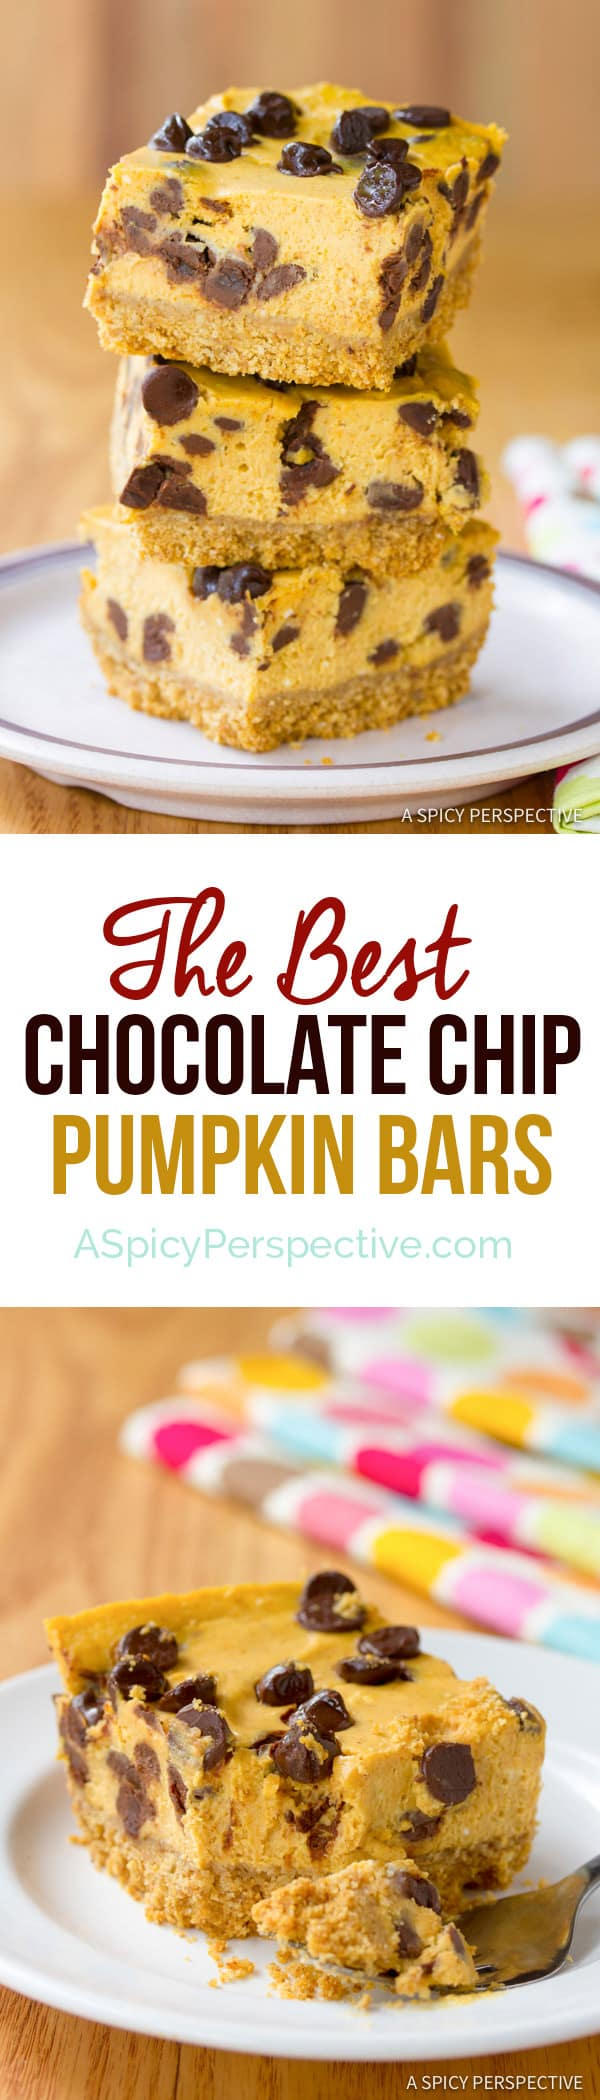 Perfect Chocolate Chip Pumpkin Bars | ASpicyPerspective.com #halloween